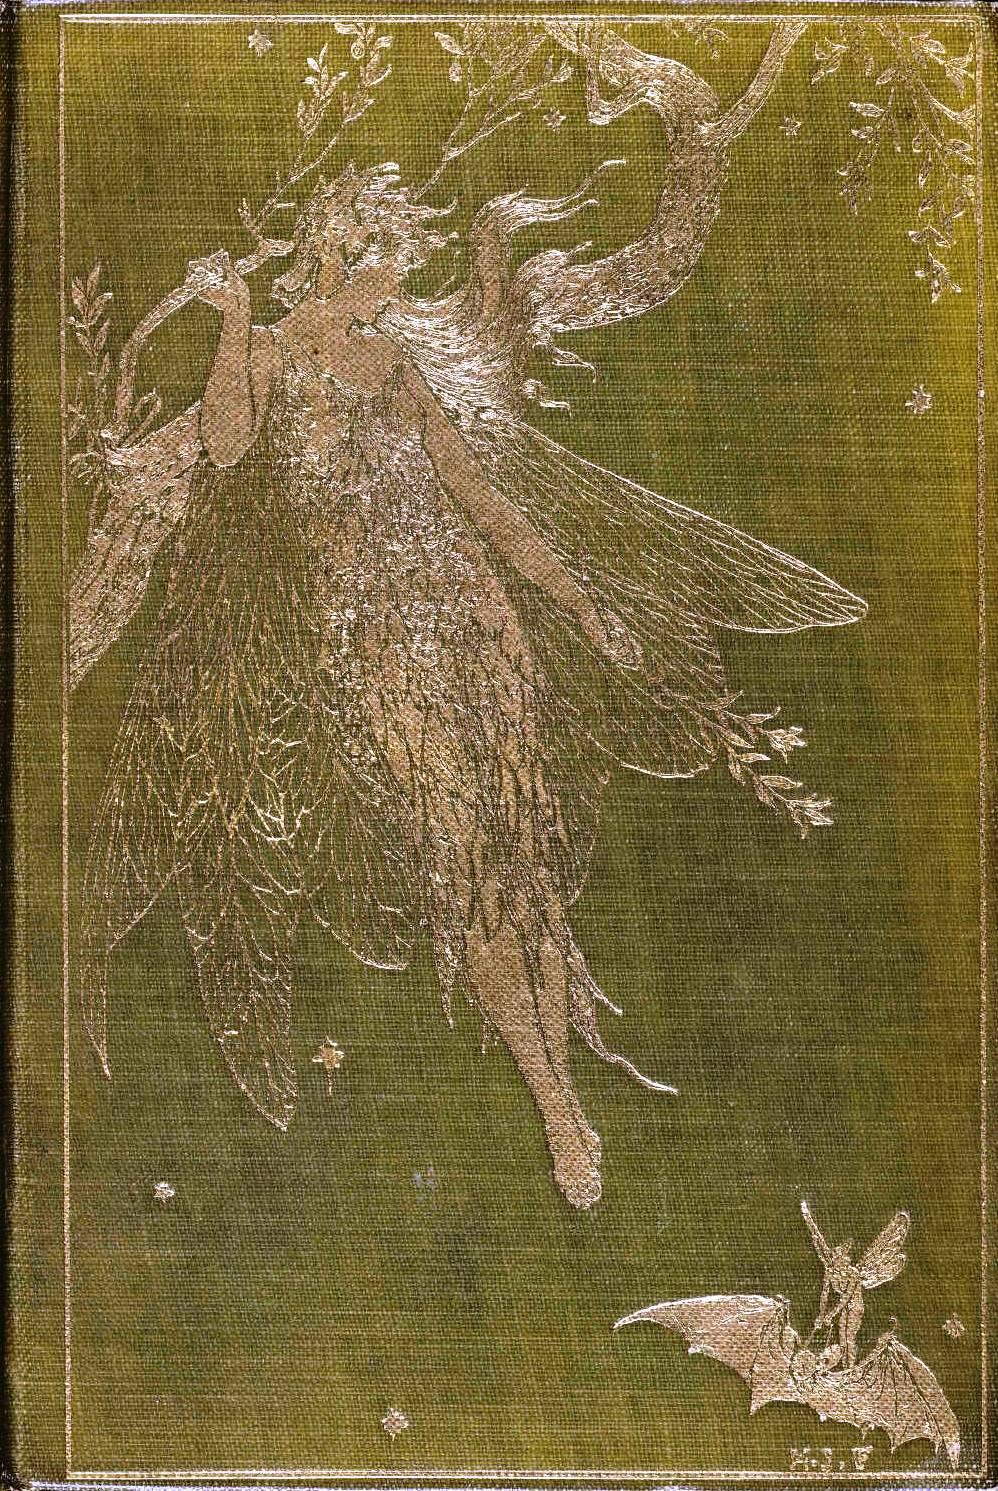 Olive Fairy